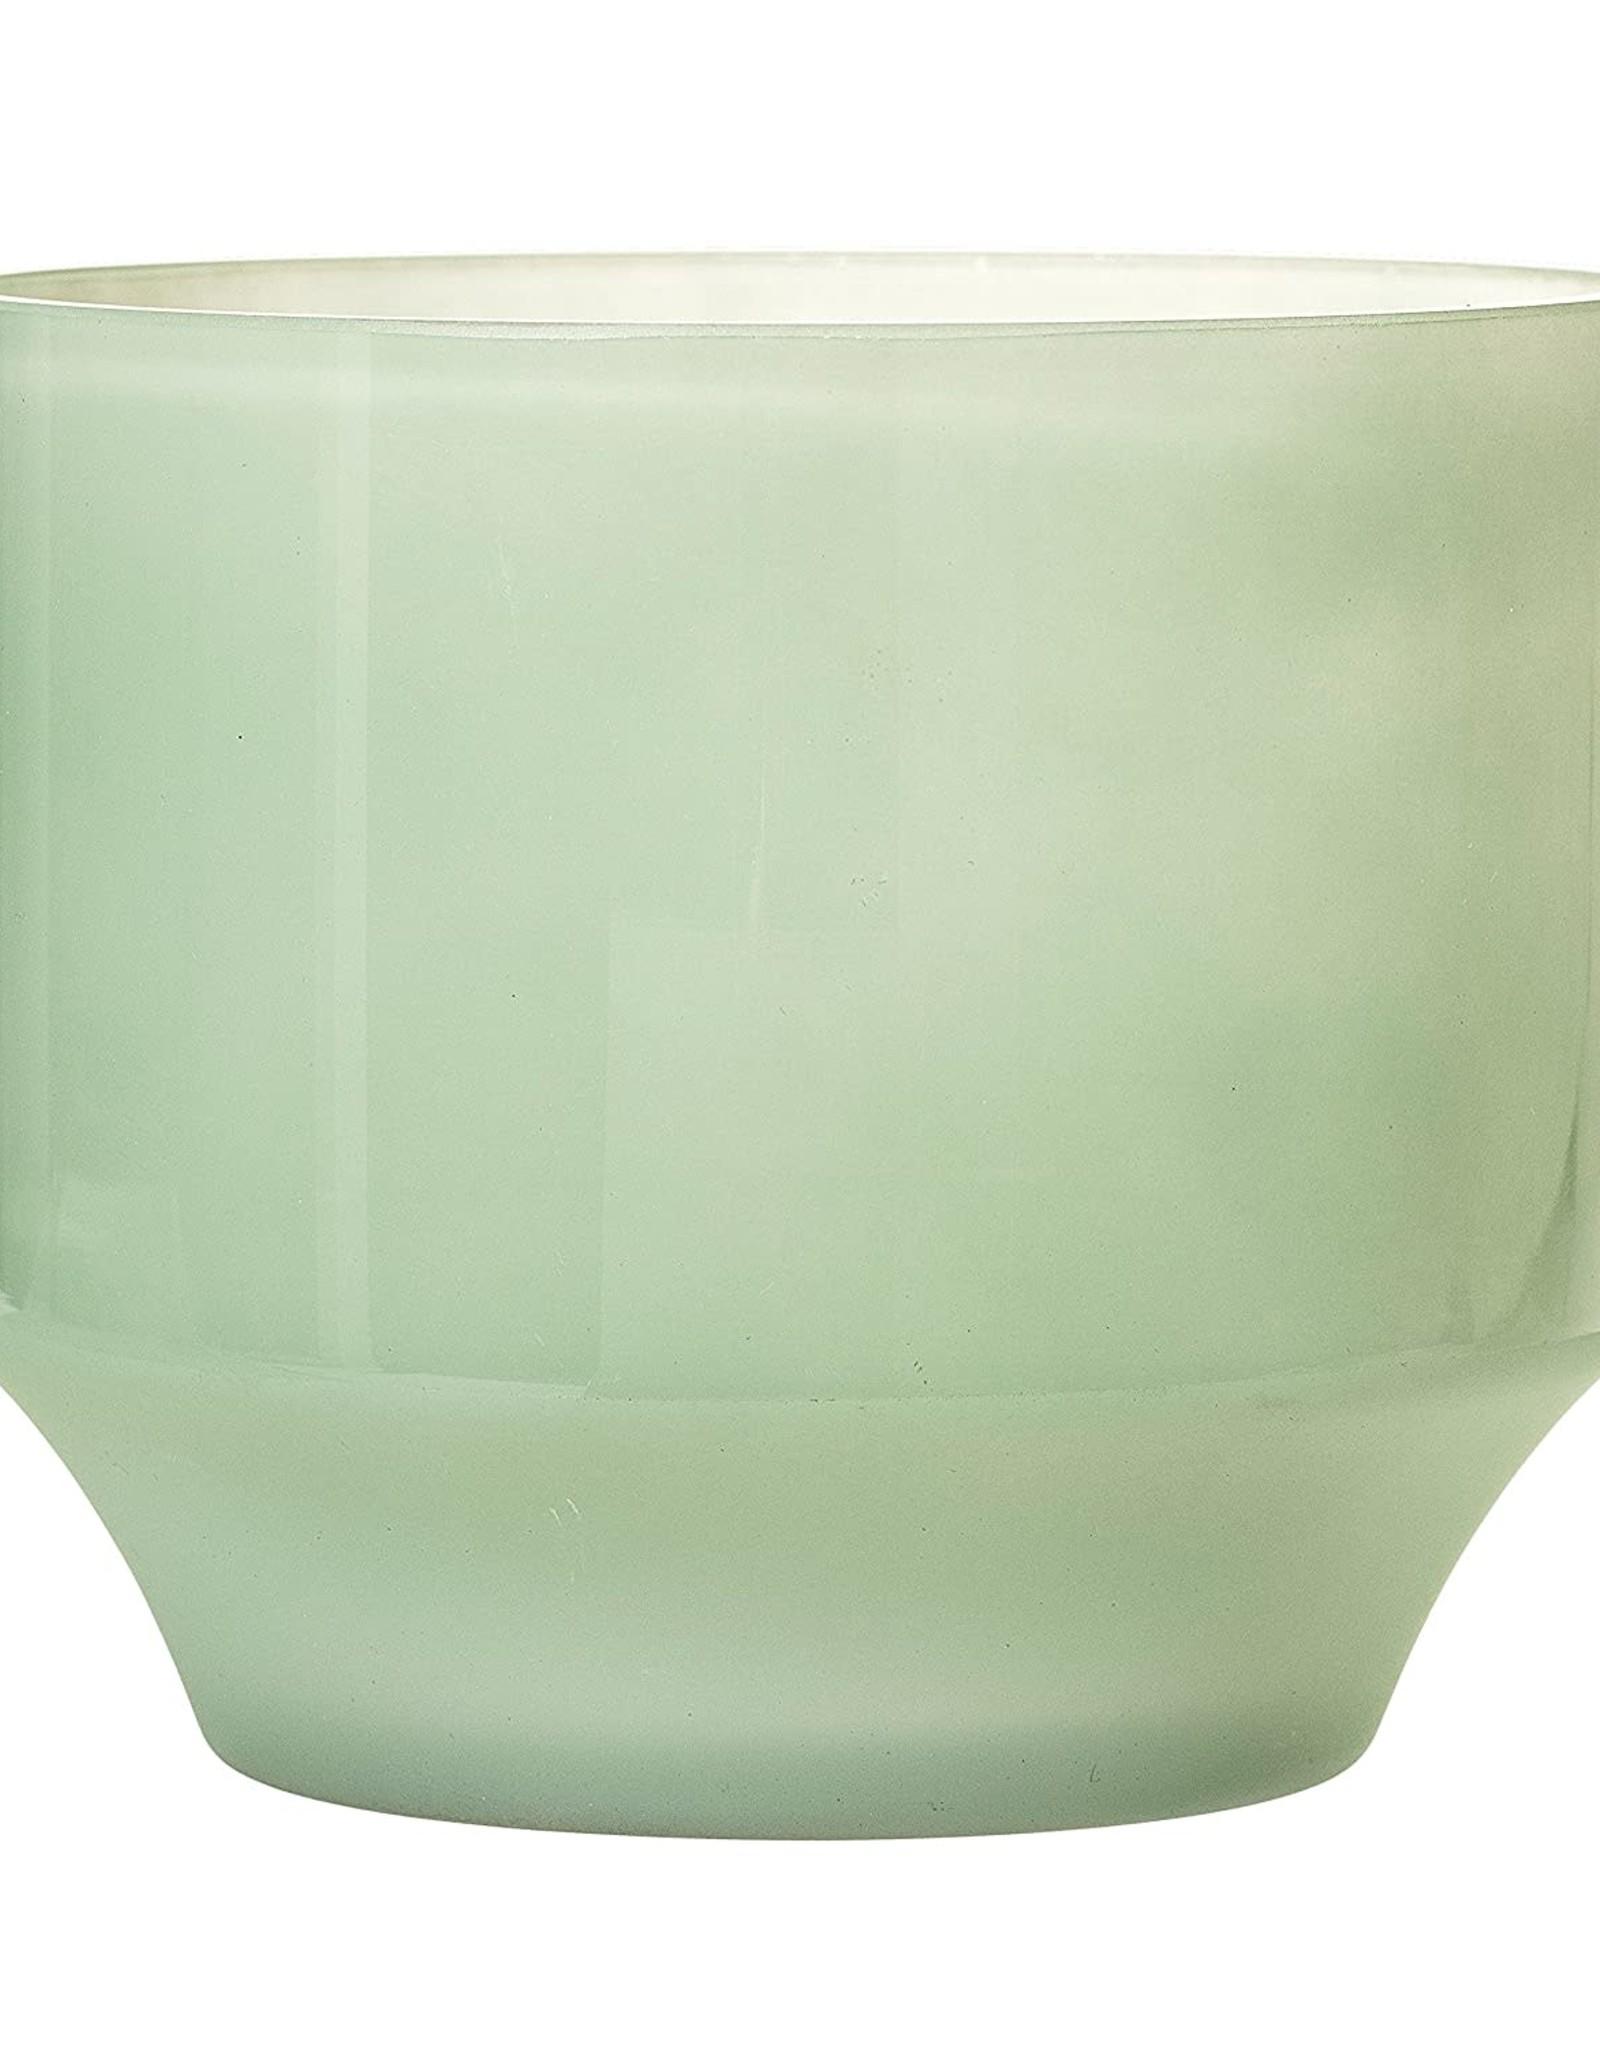 POT FLOWER GLASS 4.75 INCHES TALL GREEN